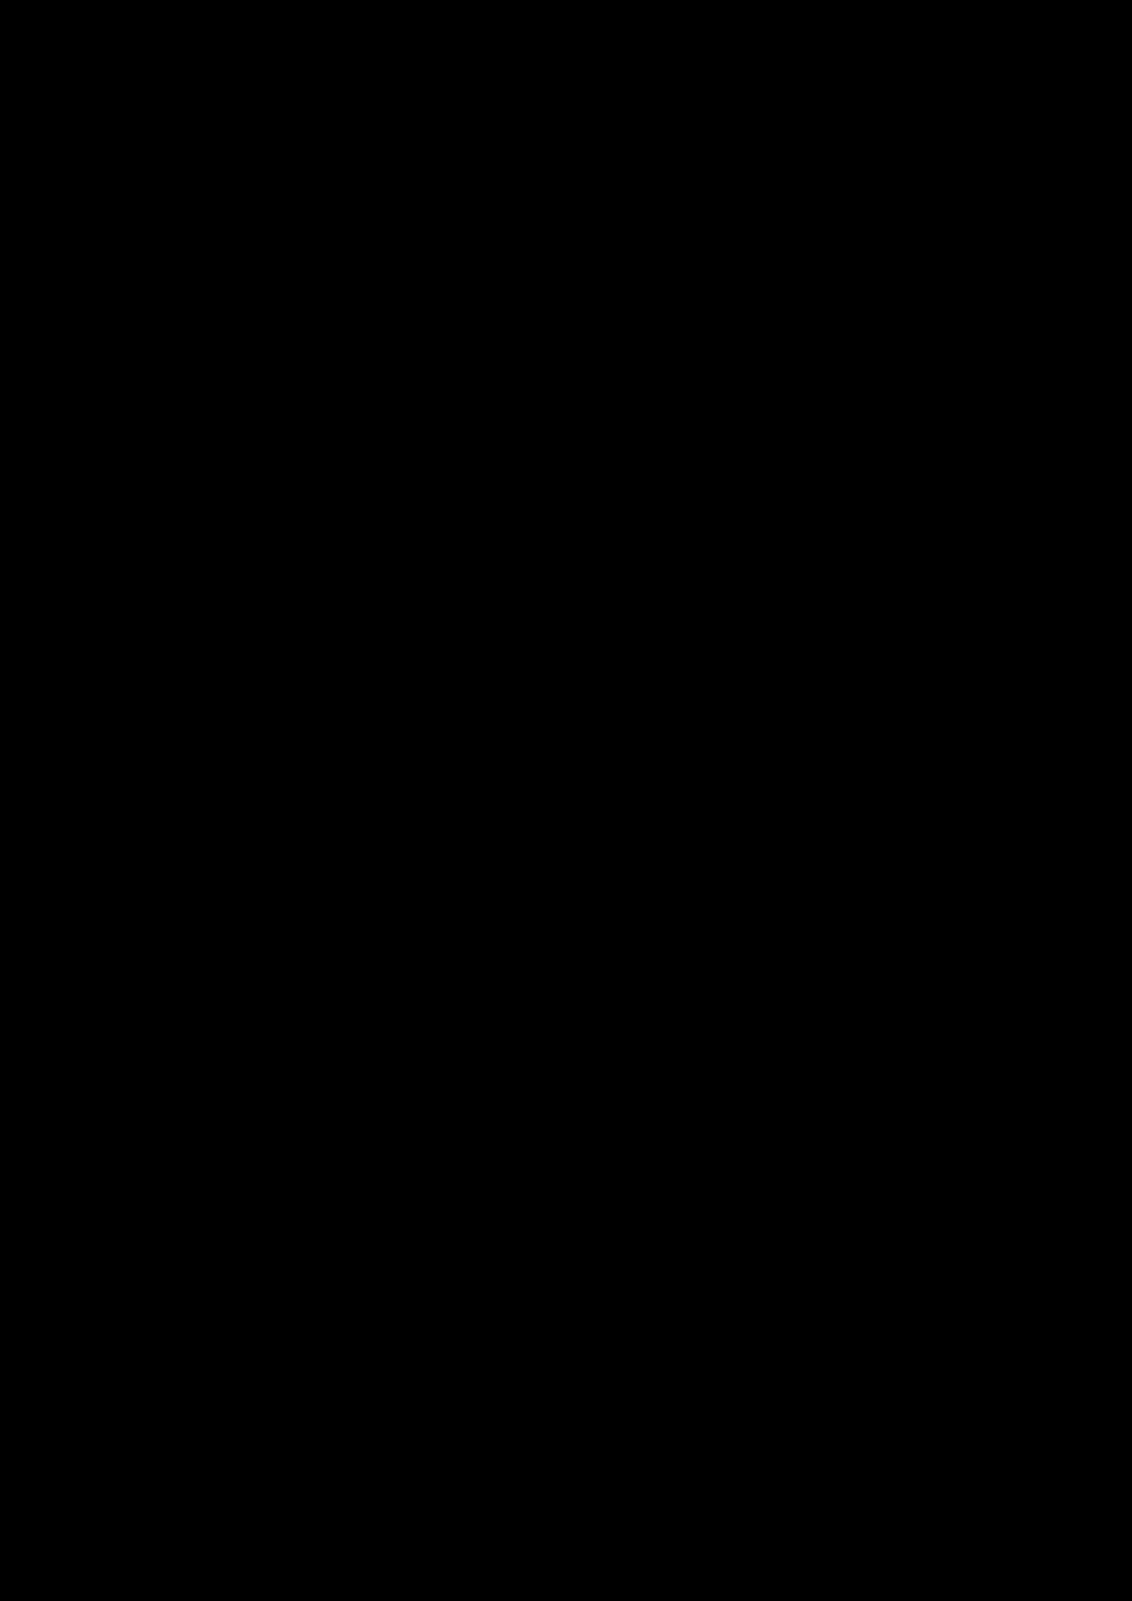 Mrs. Vandebilt slide, Image 31